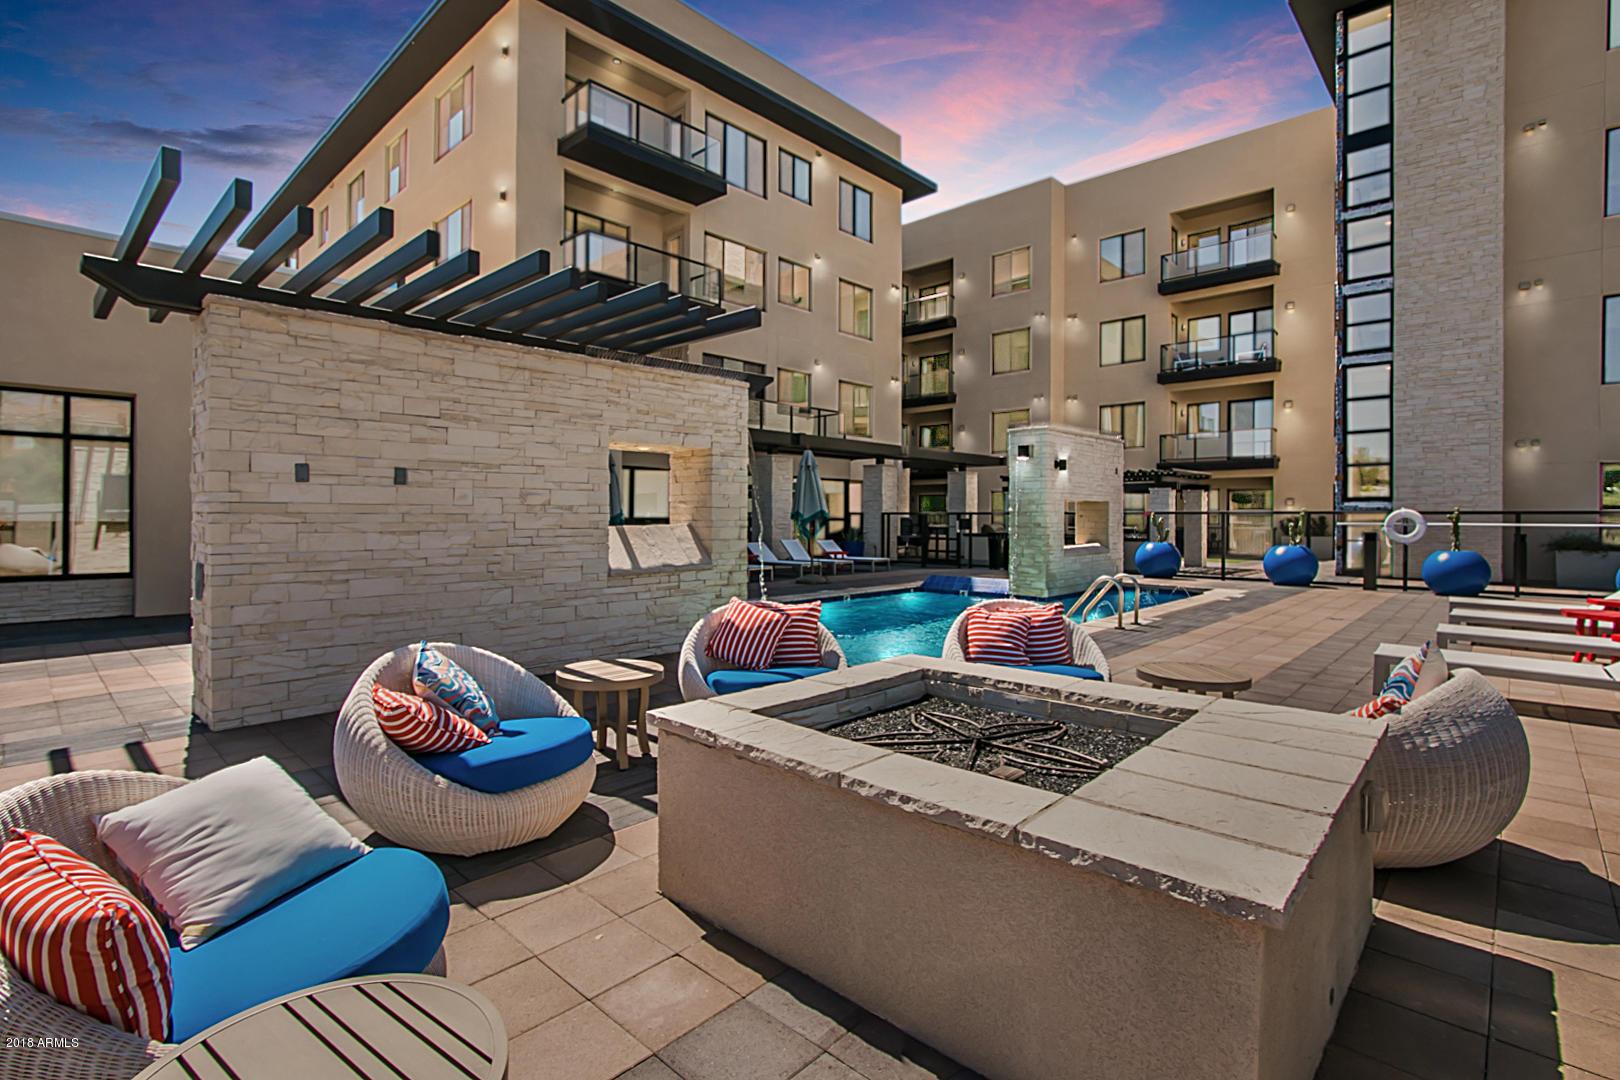 MLS 5782886 7300 E Earll Drive Unit 3009, Scottsdale, AZ 85251 Scottsdale AZ Spec Home